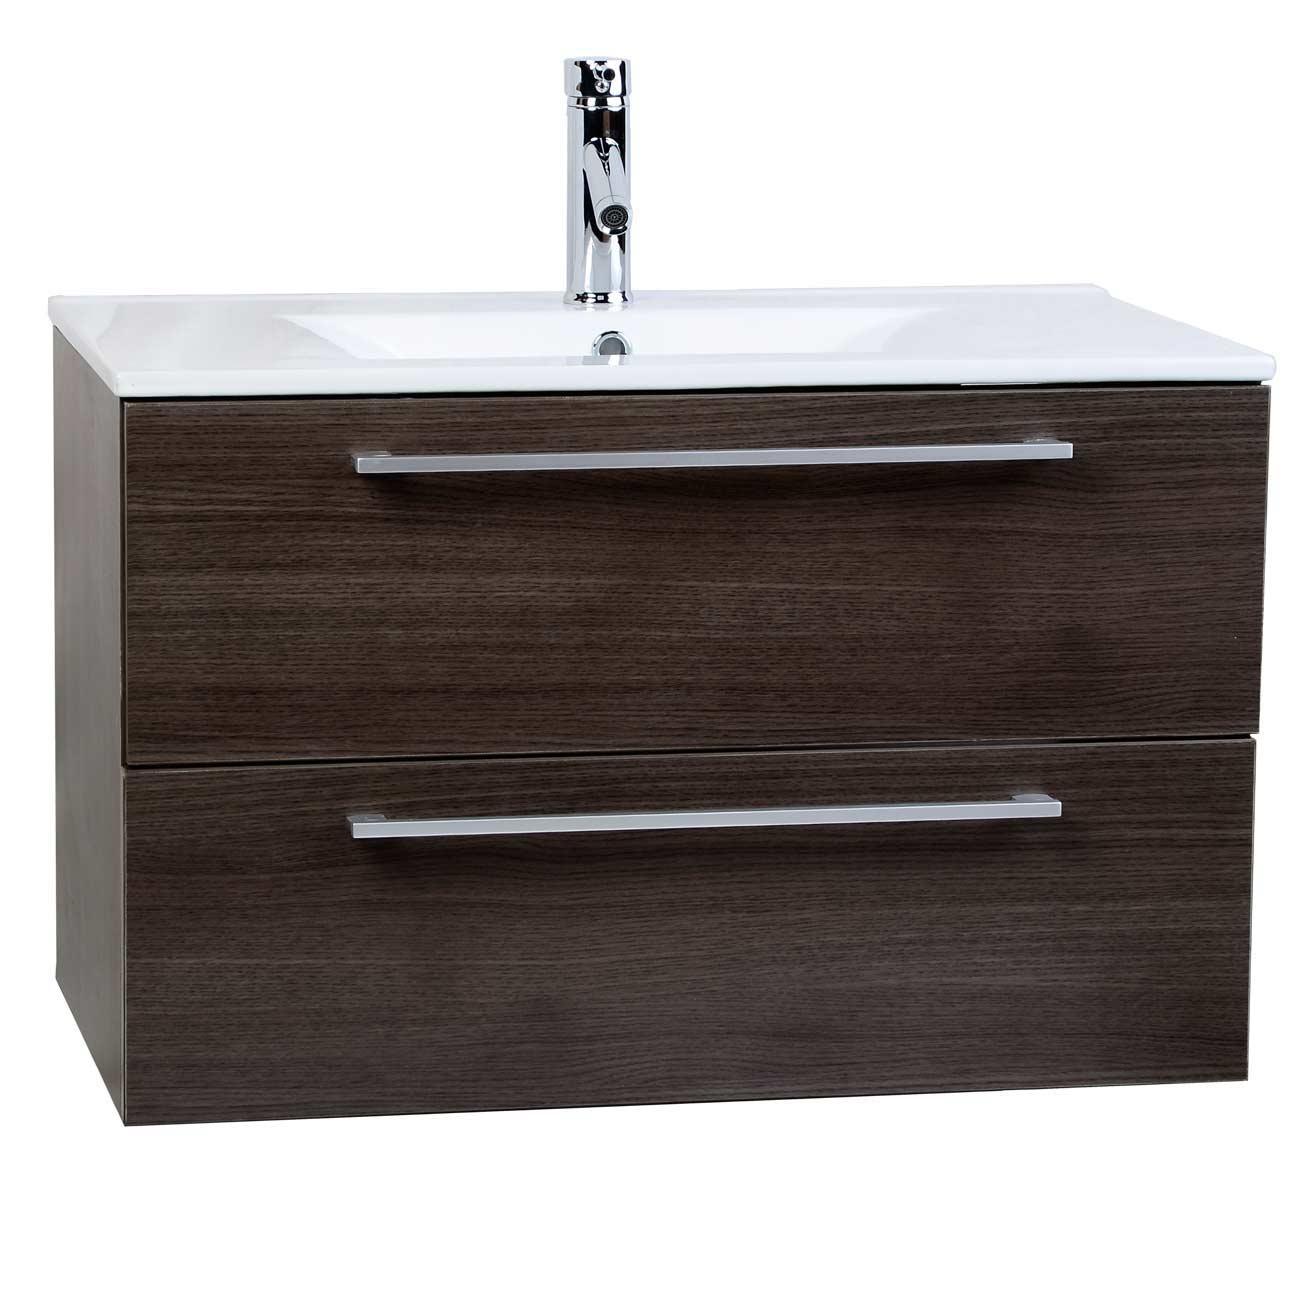 Cabinets To Go Bathroom Vanities To Go Globorank